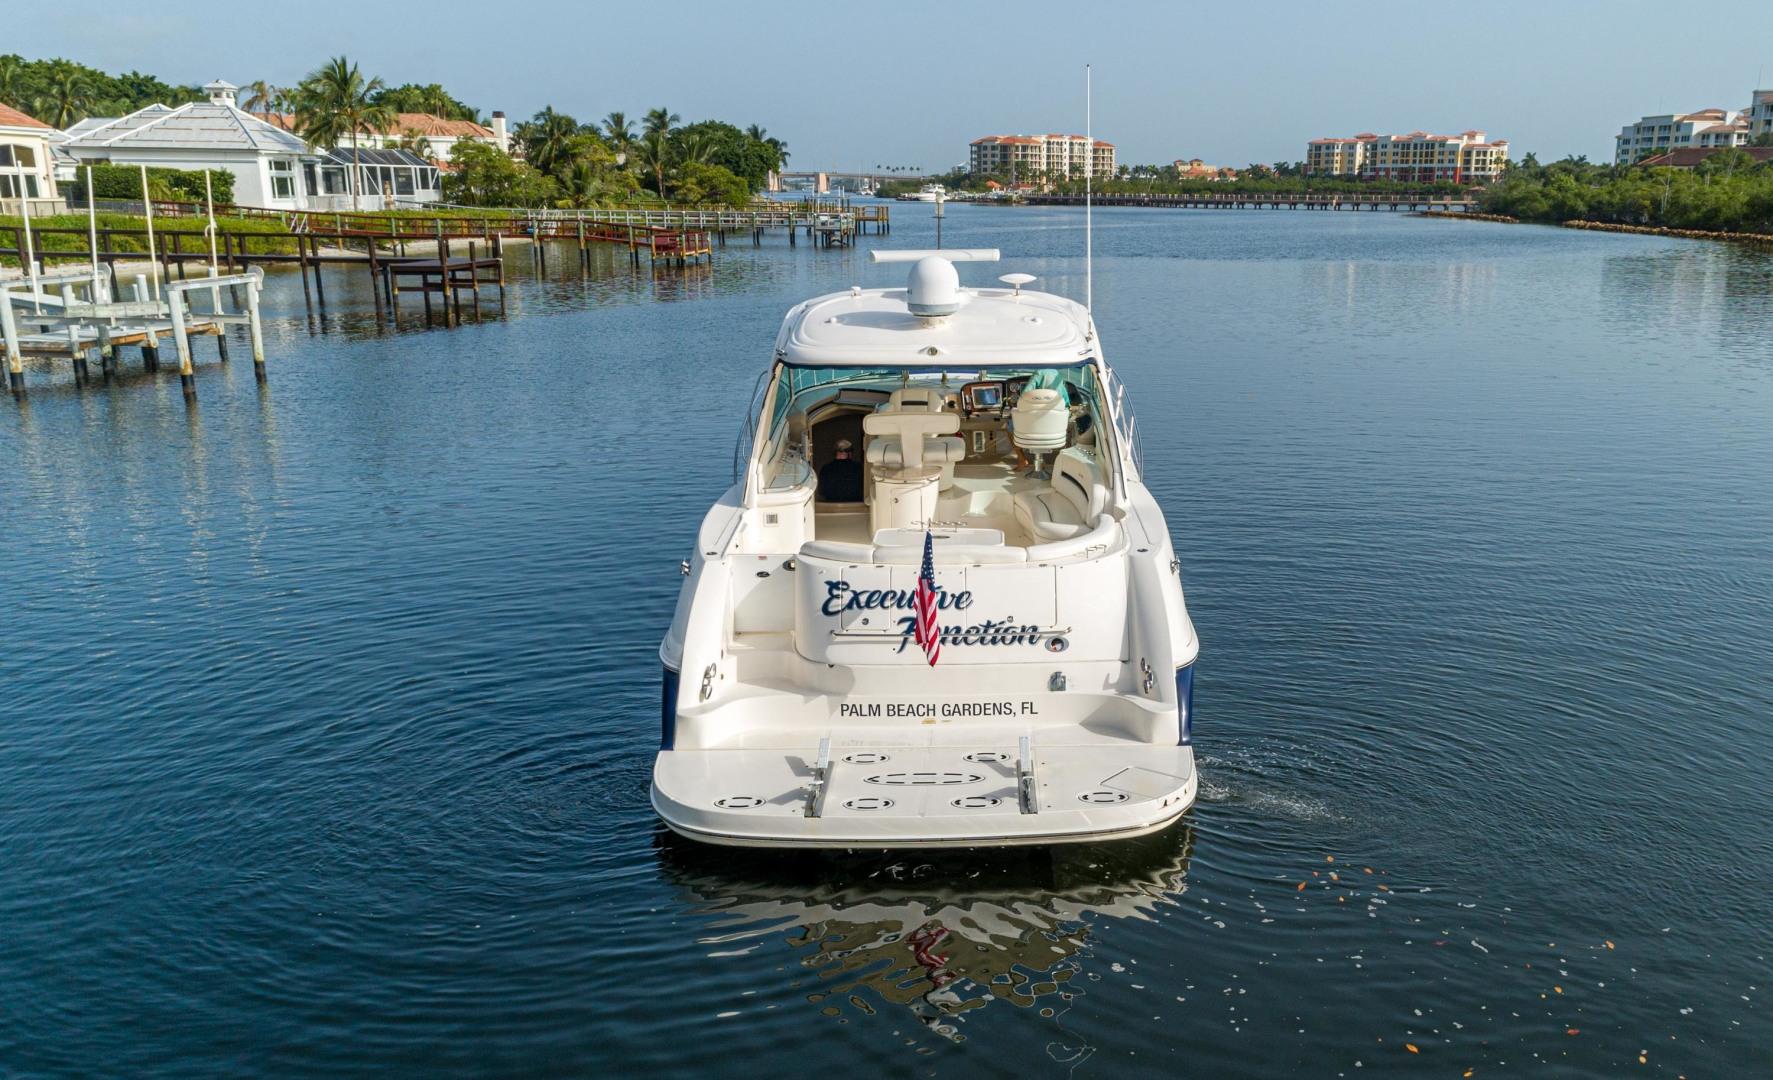 Sea Ray-Sundancer 2005-EXECUTIVE FUNCTION Jupiter-Florida-United States-Stern-1481970 | Thumbnail